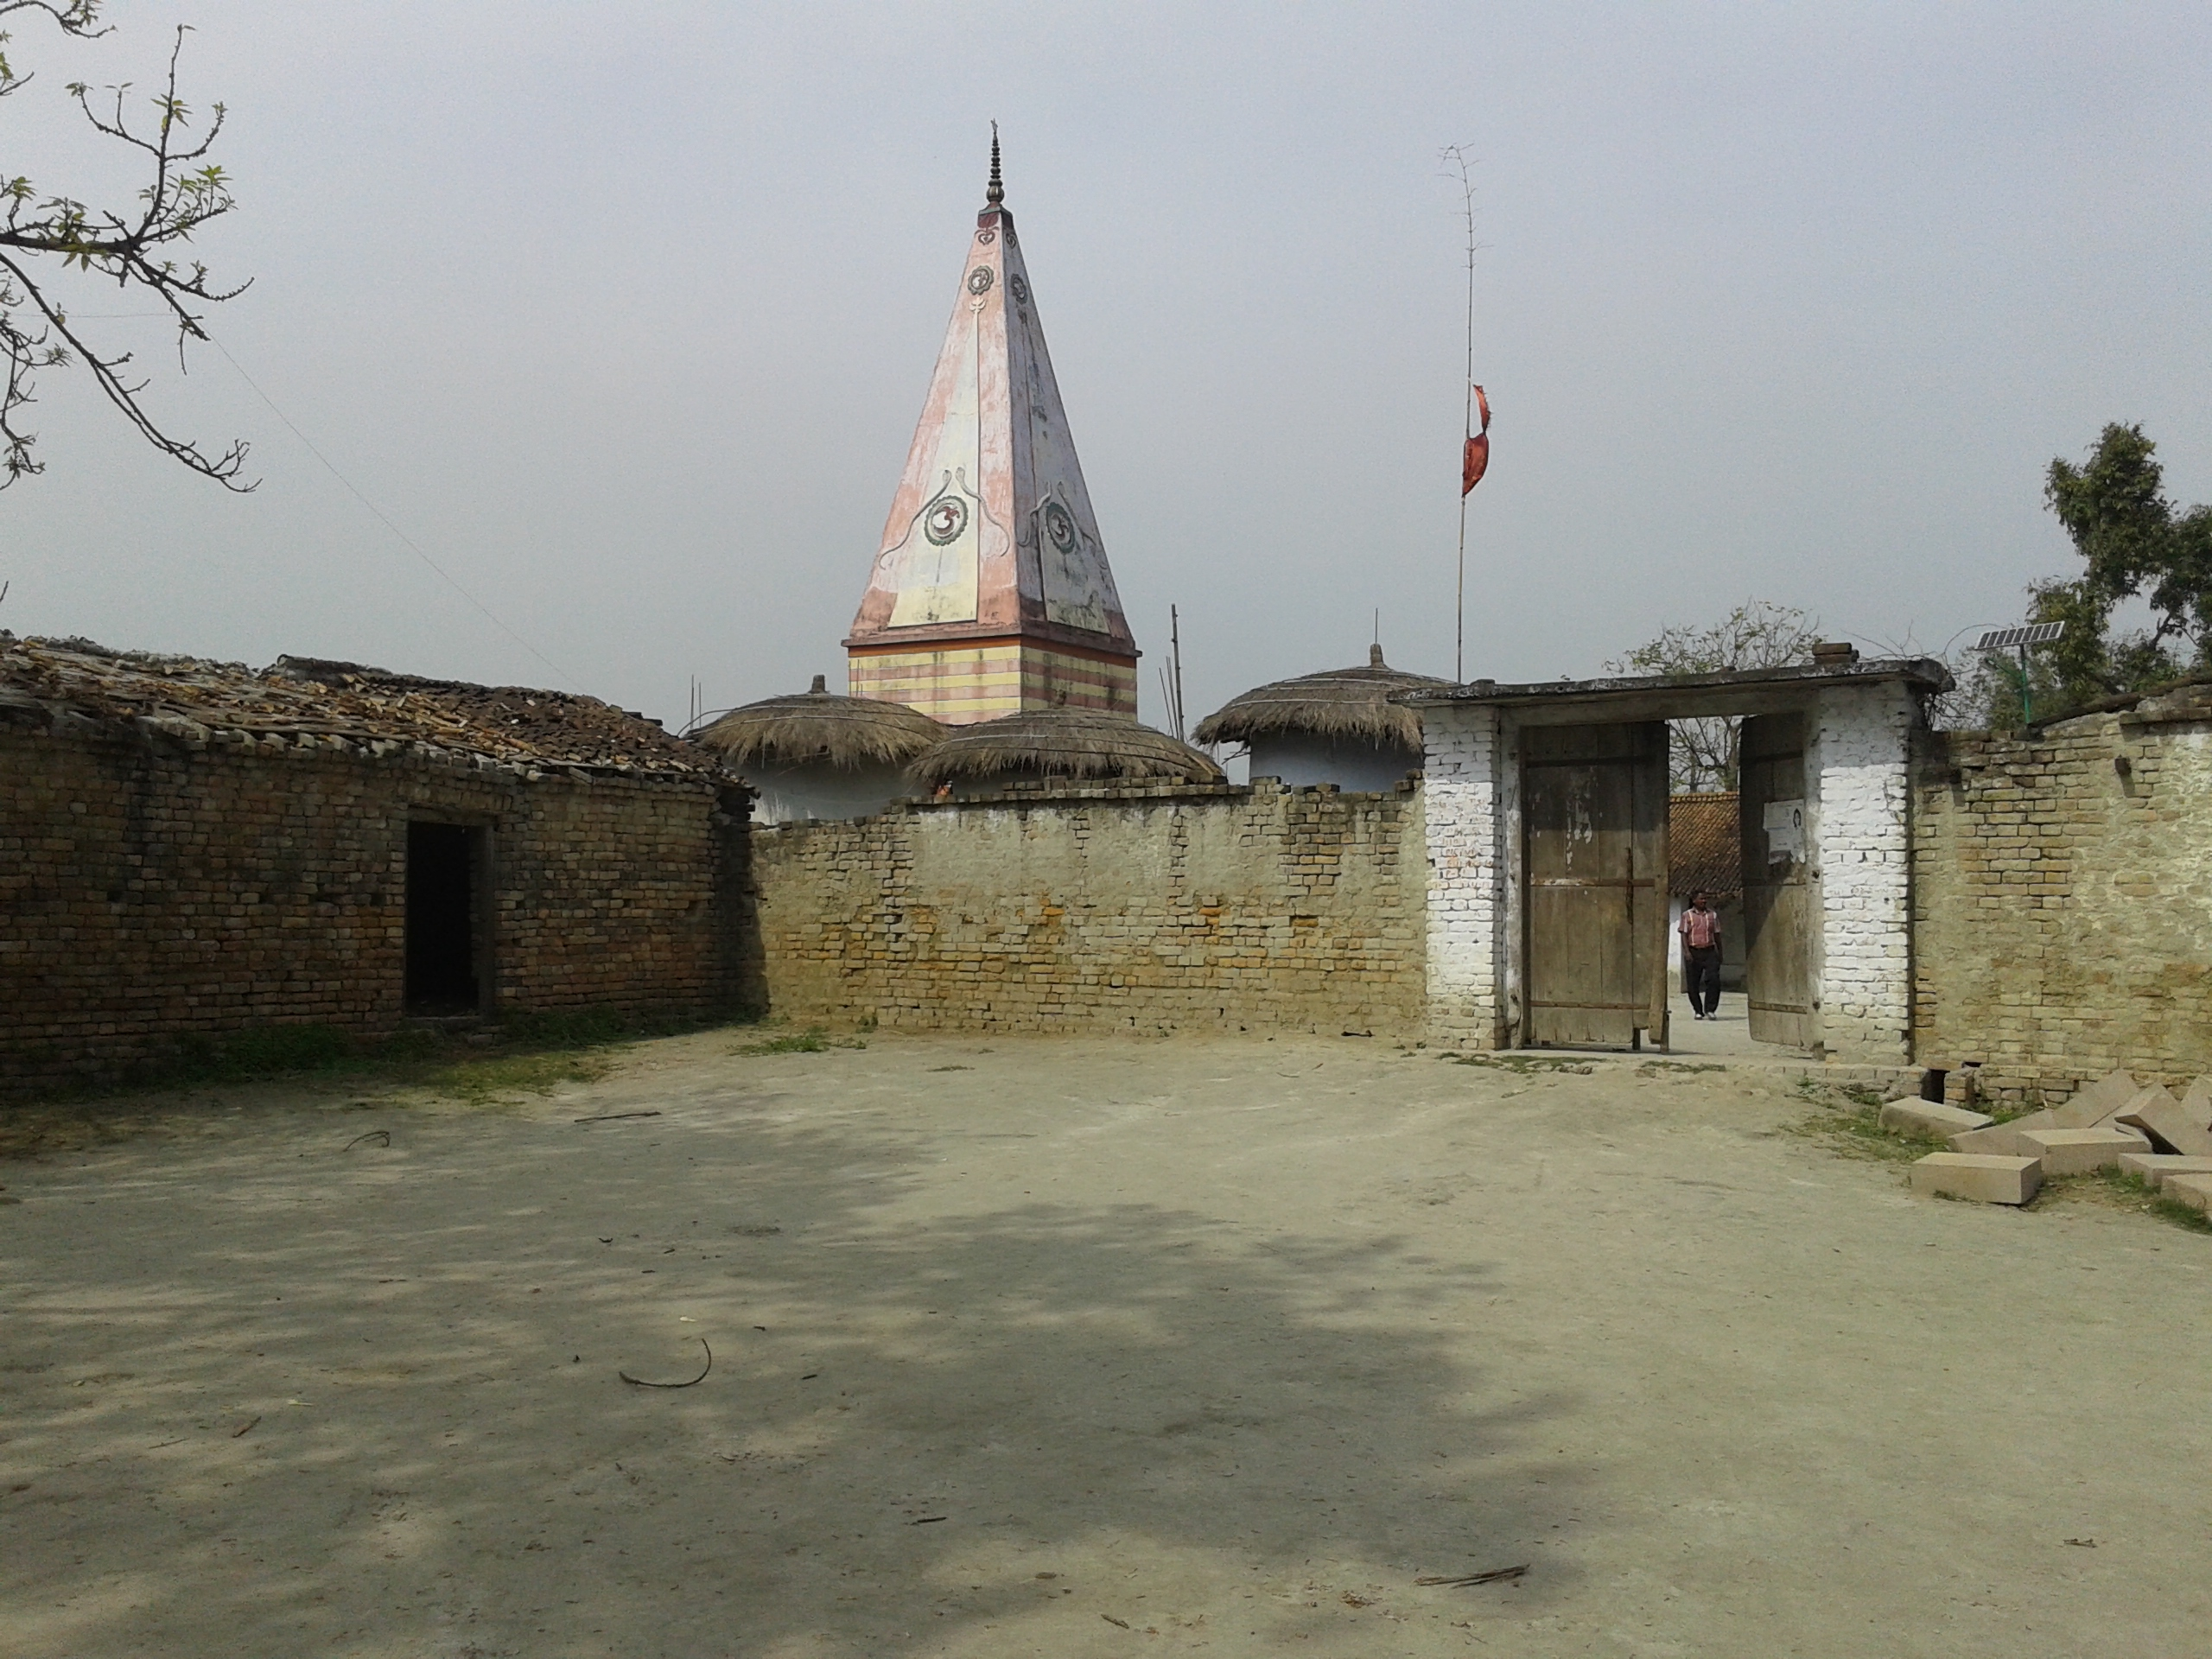 narmadeshwar-mahadev-mandir-bahuara-outside-view